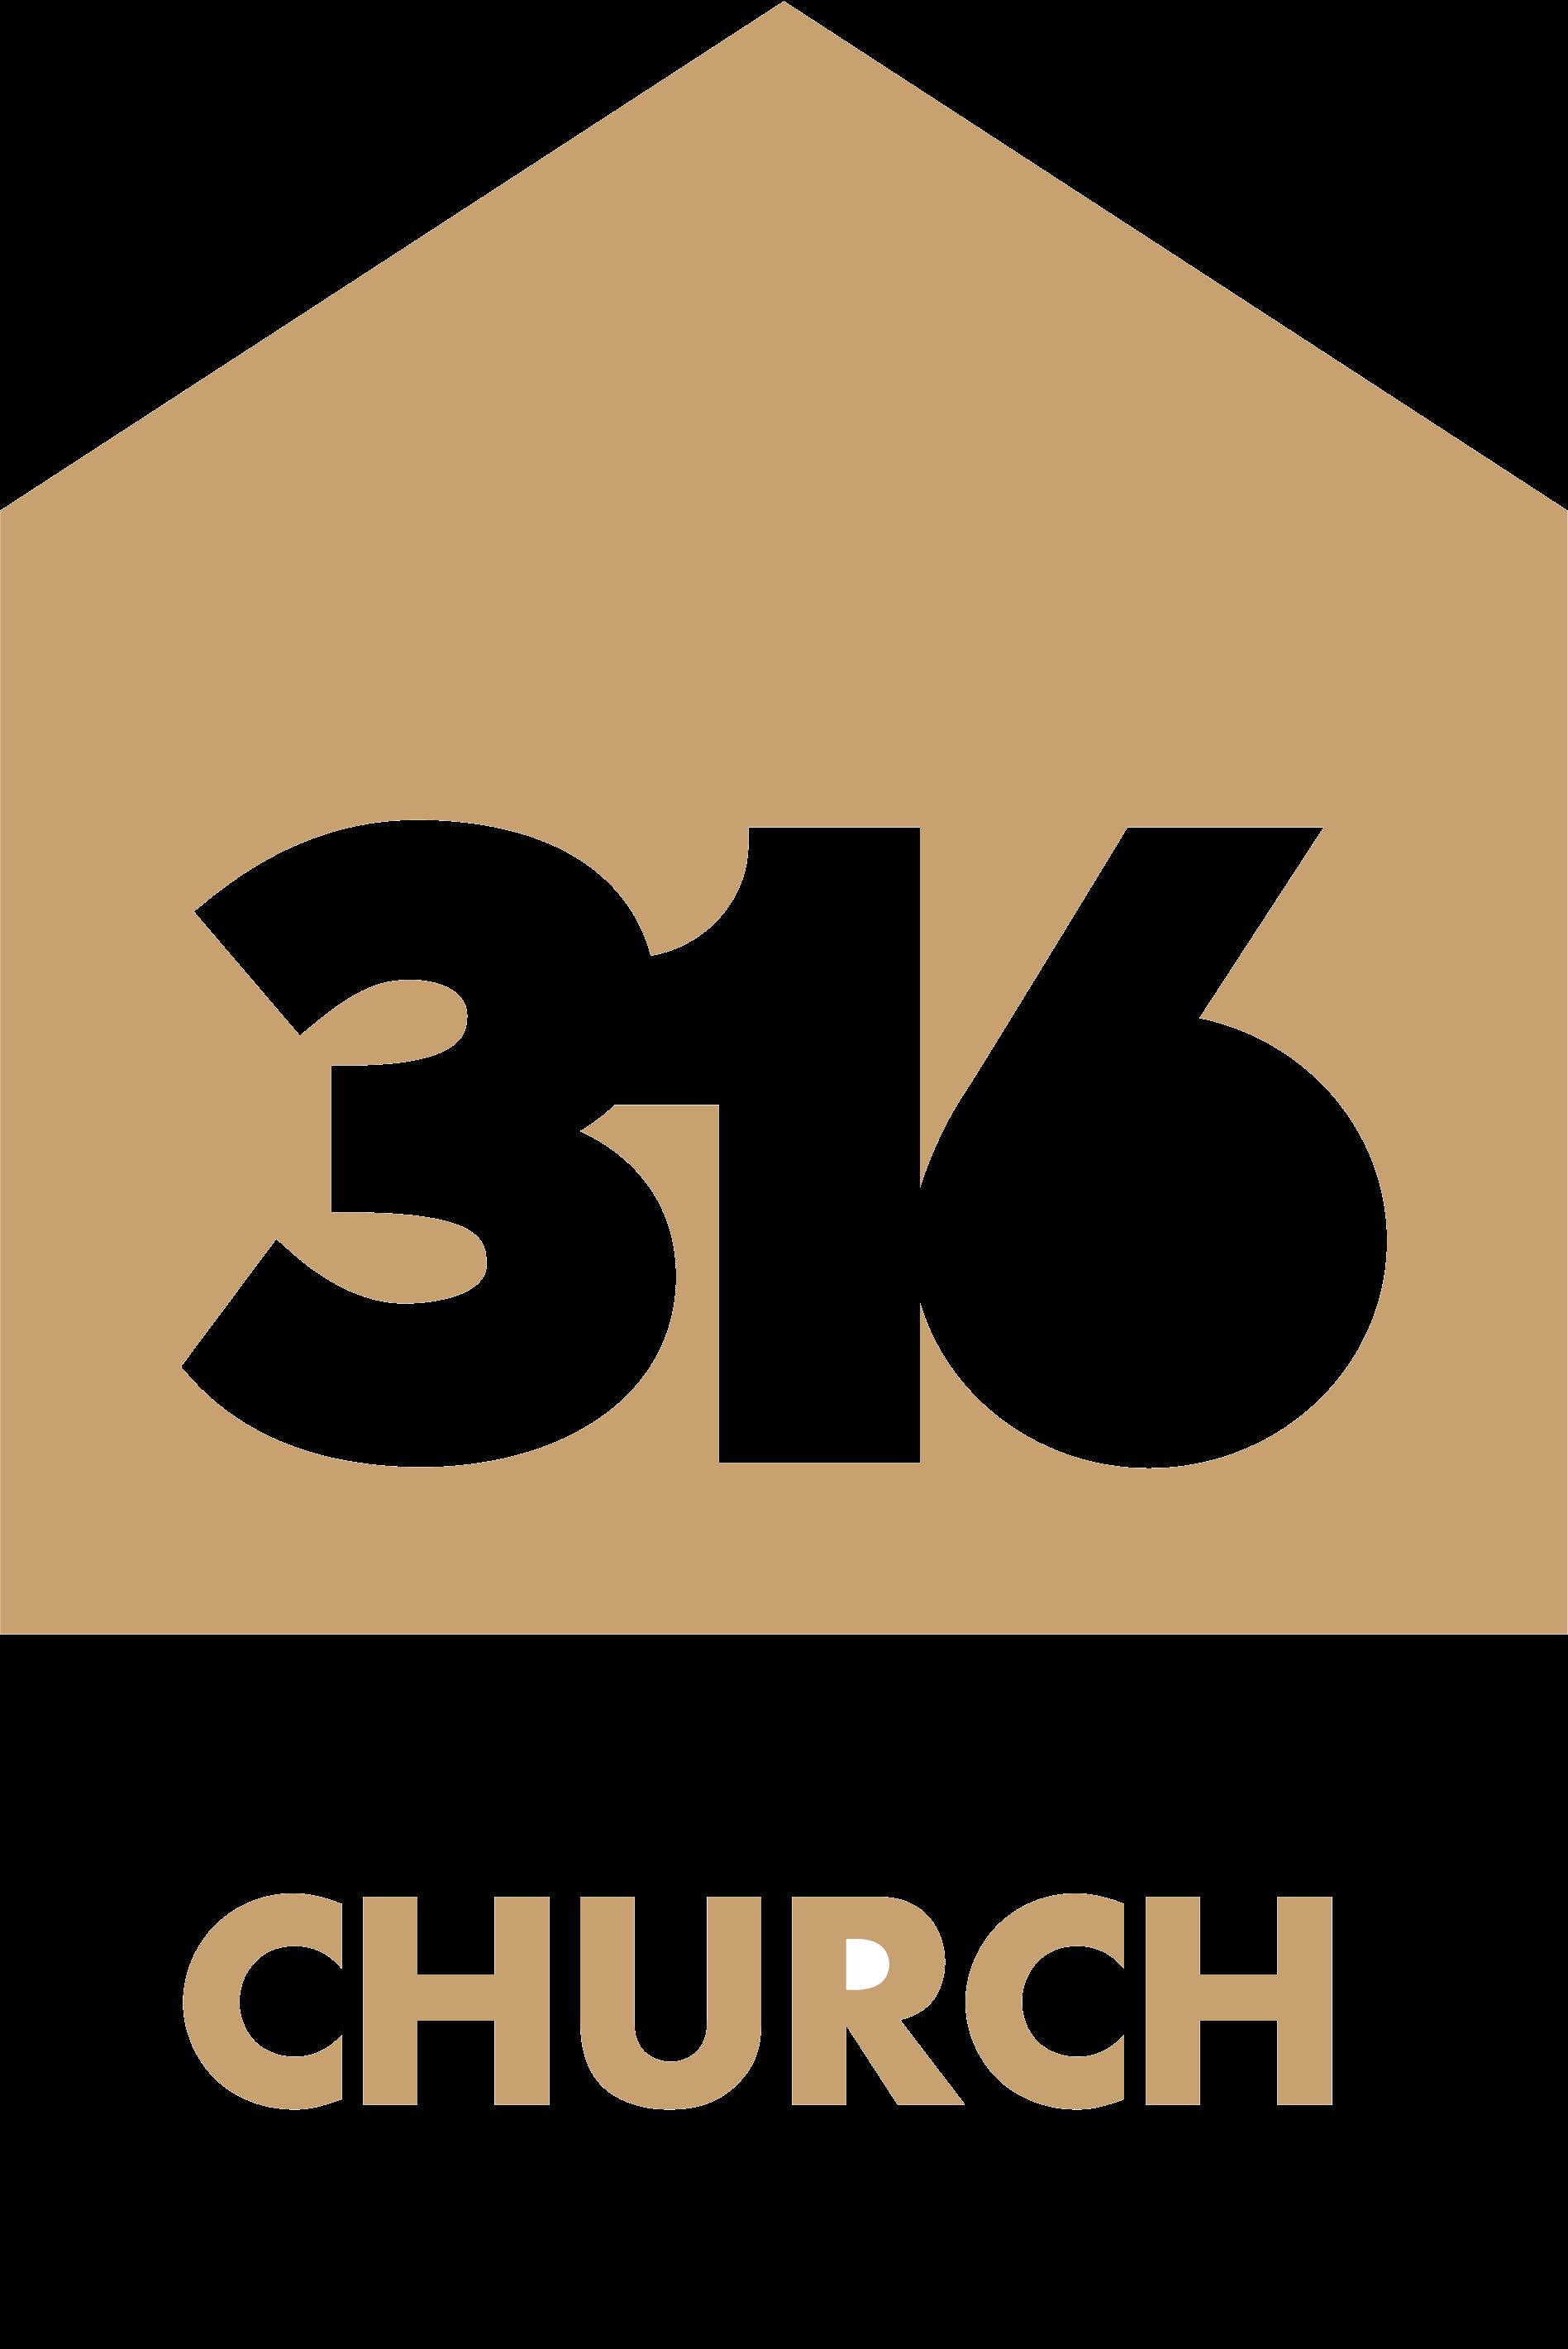 316 CHURCH GOLD TRANSPARARENTE